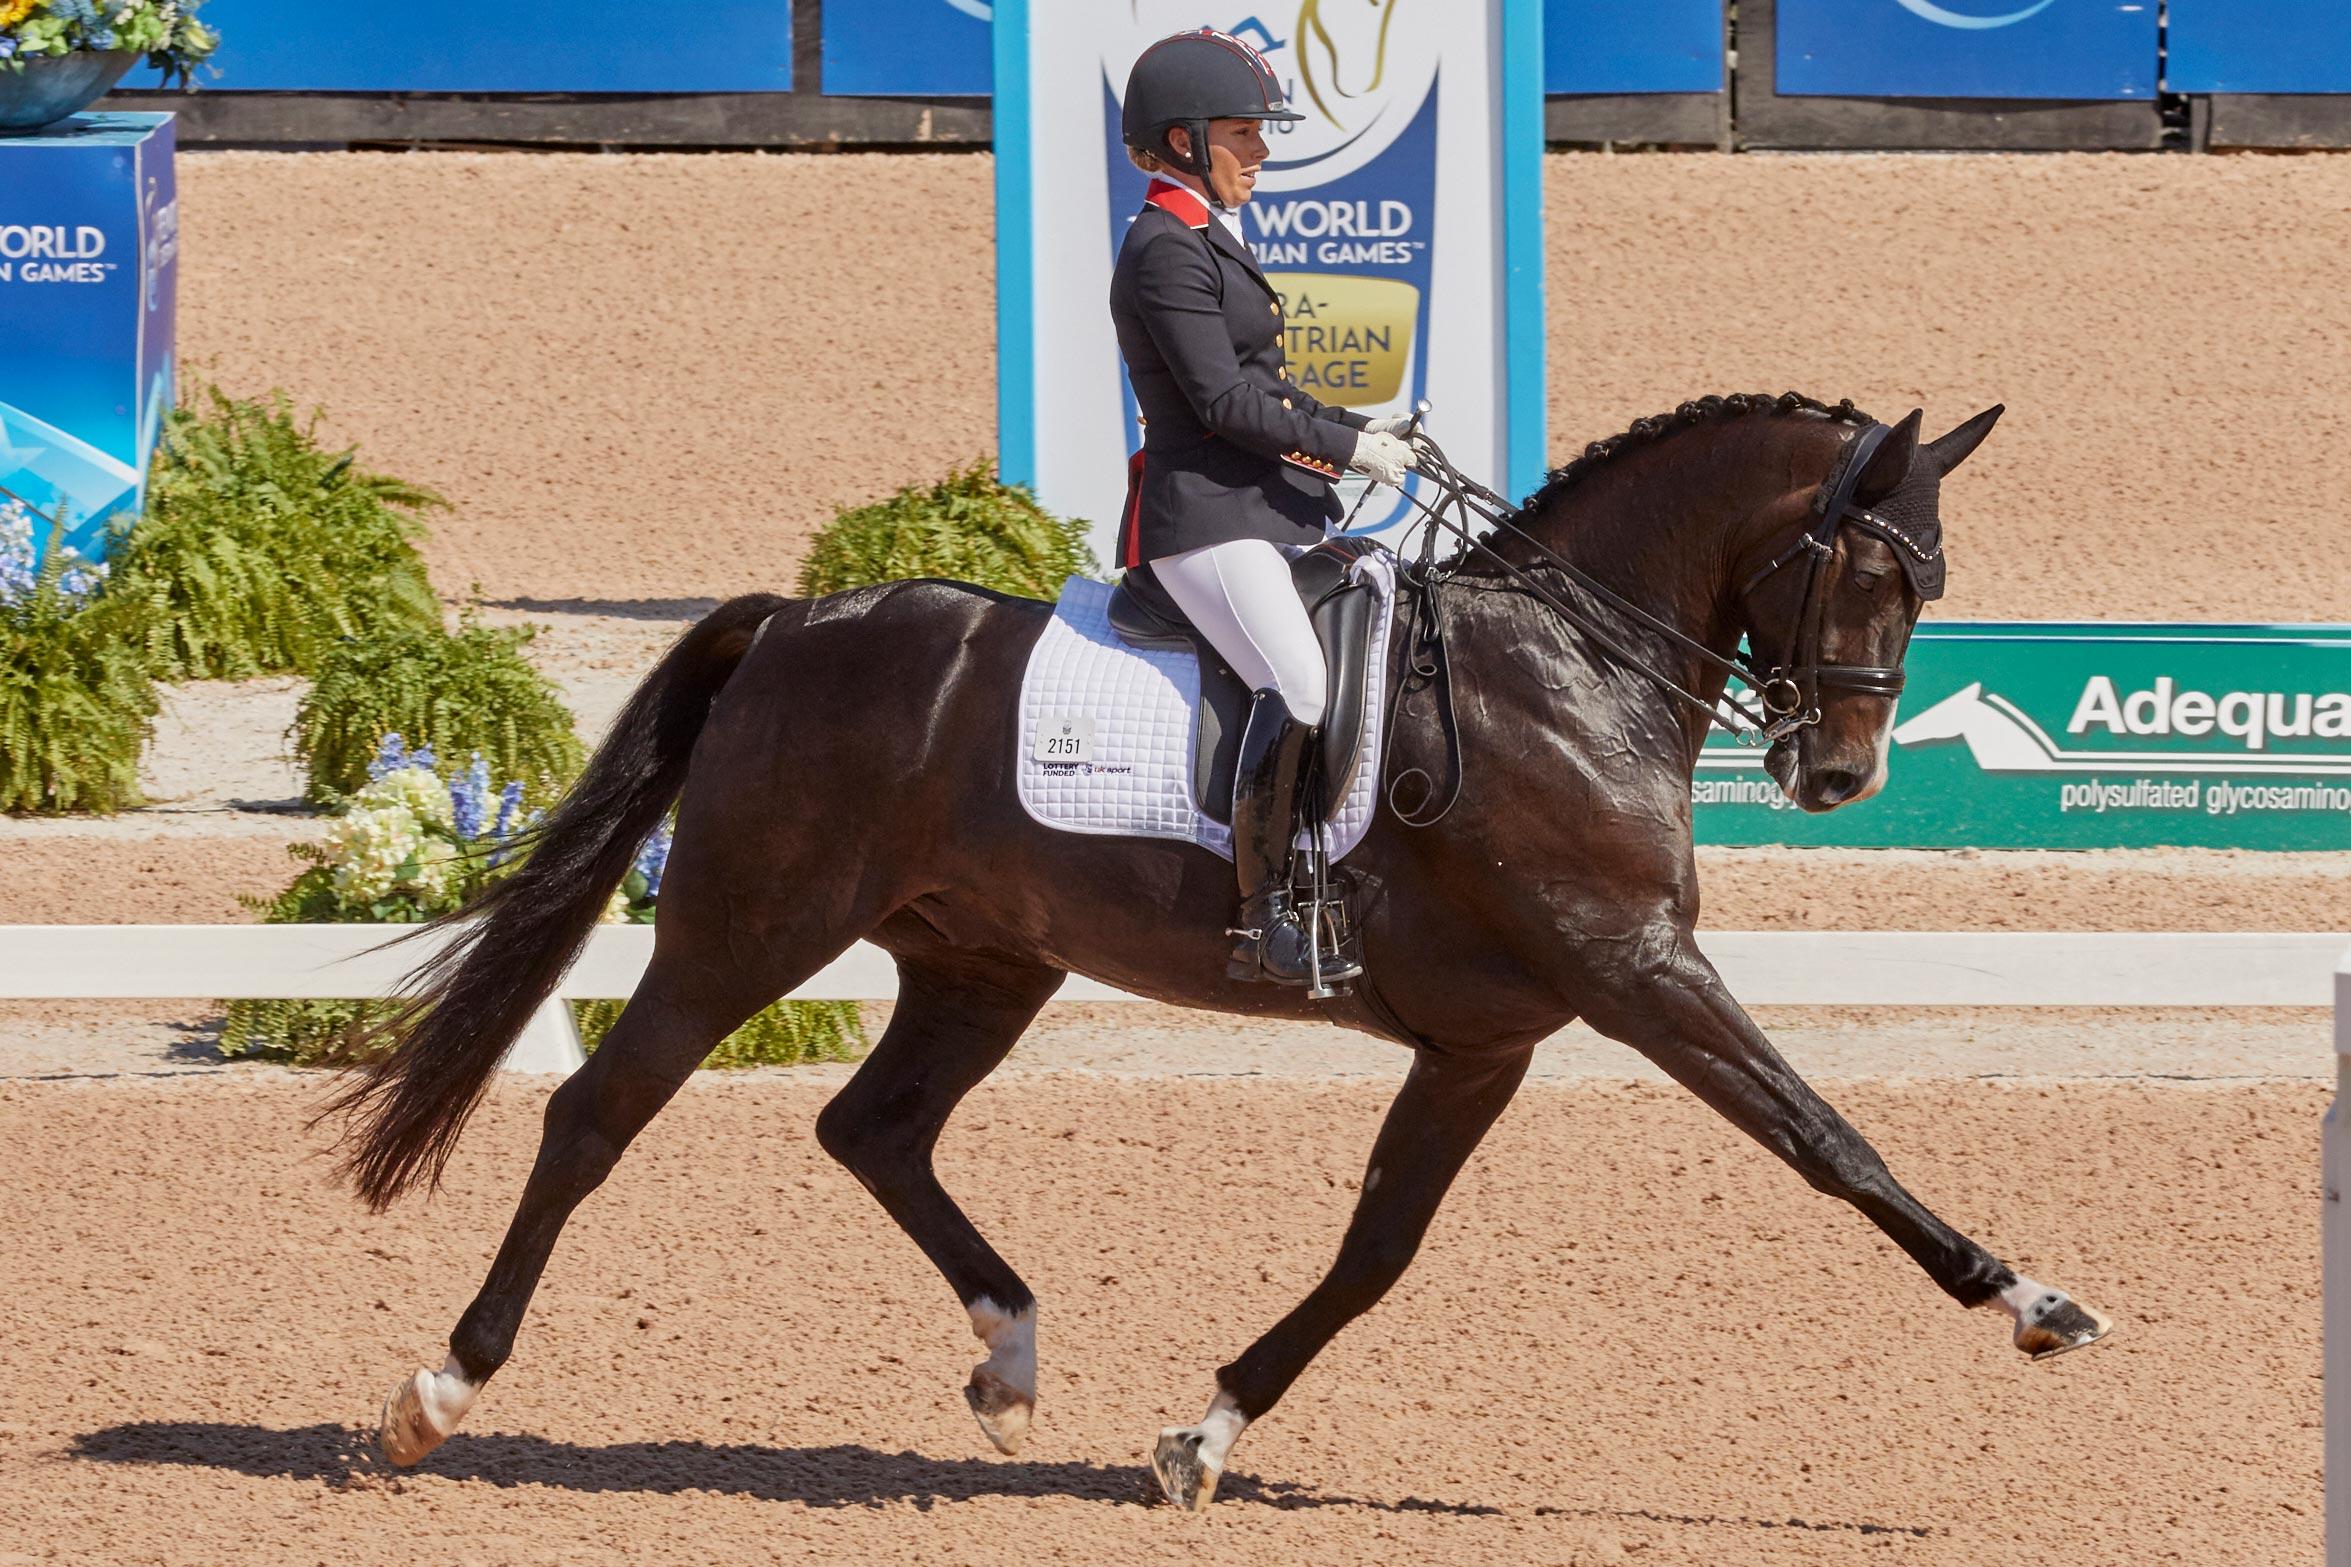 FEI World Equestrian Games™ Tryon USA FEI World Equestrian Games™ Tryon USA Sophie Wells GBR on C Fatal Attraction Photo FEI/Liz Gregg